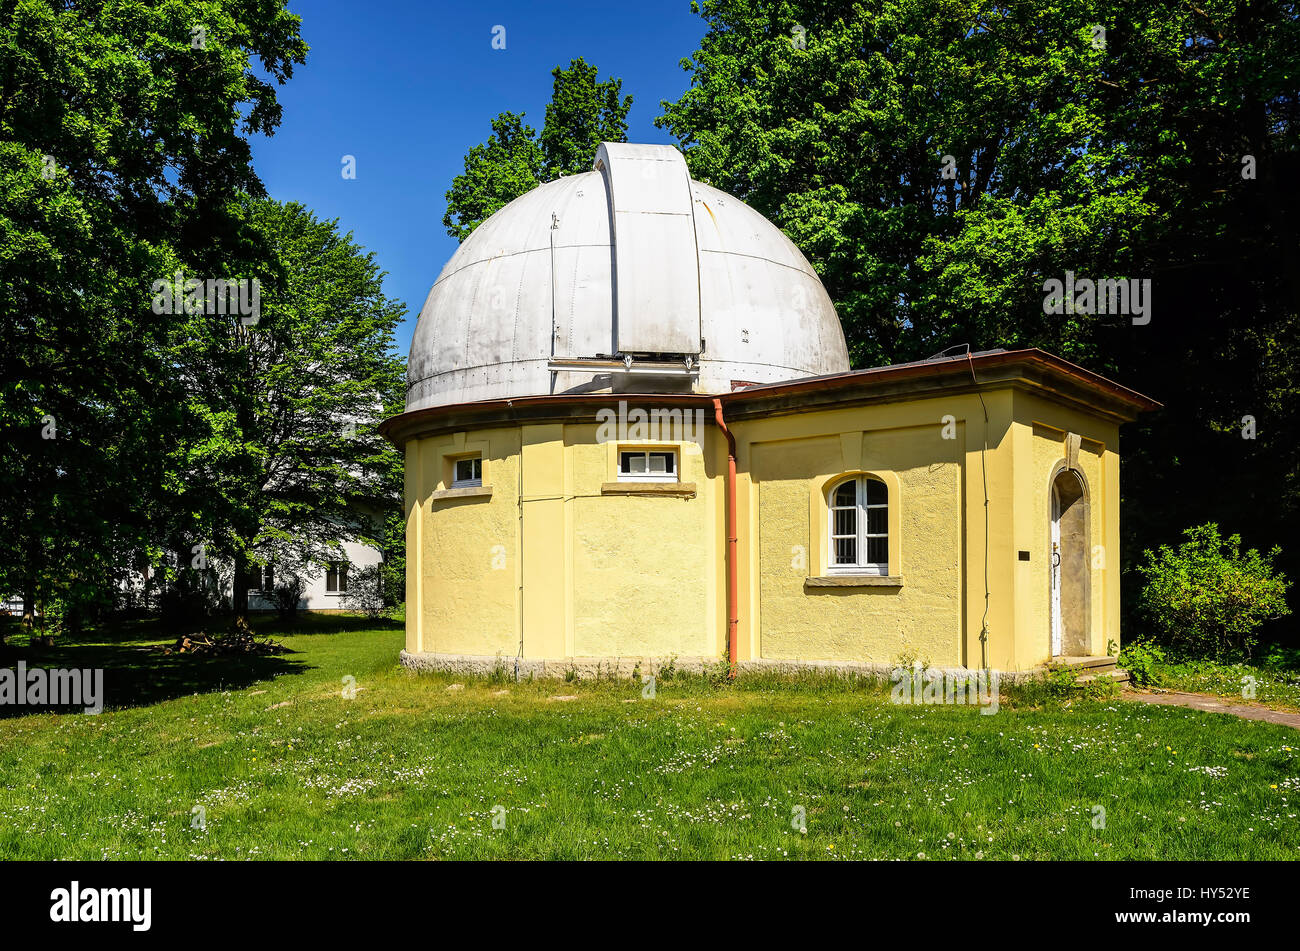 Observatory of Hamburg, equatorially in mountain village, Hamburg, Germany, Europe, Sternwarte Hamburg, das aequatorial Stock Photo